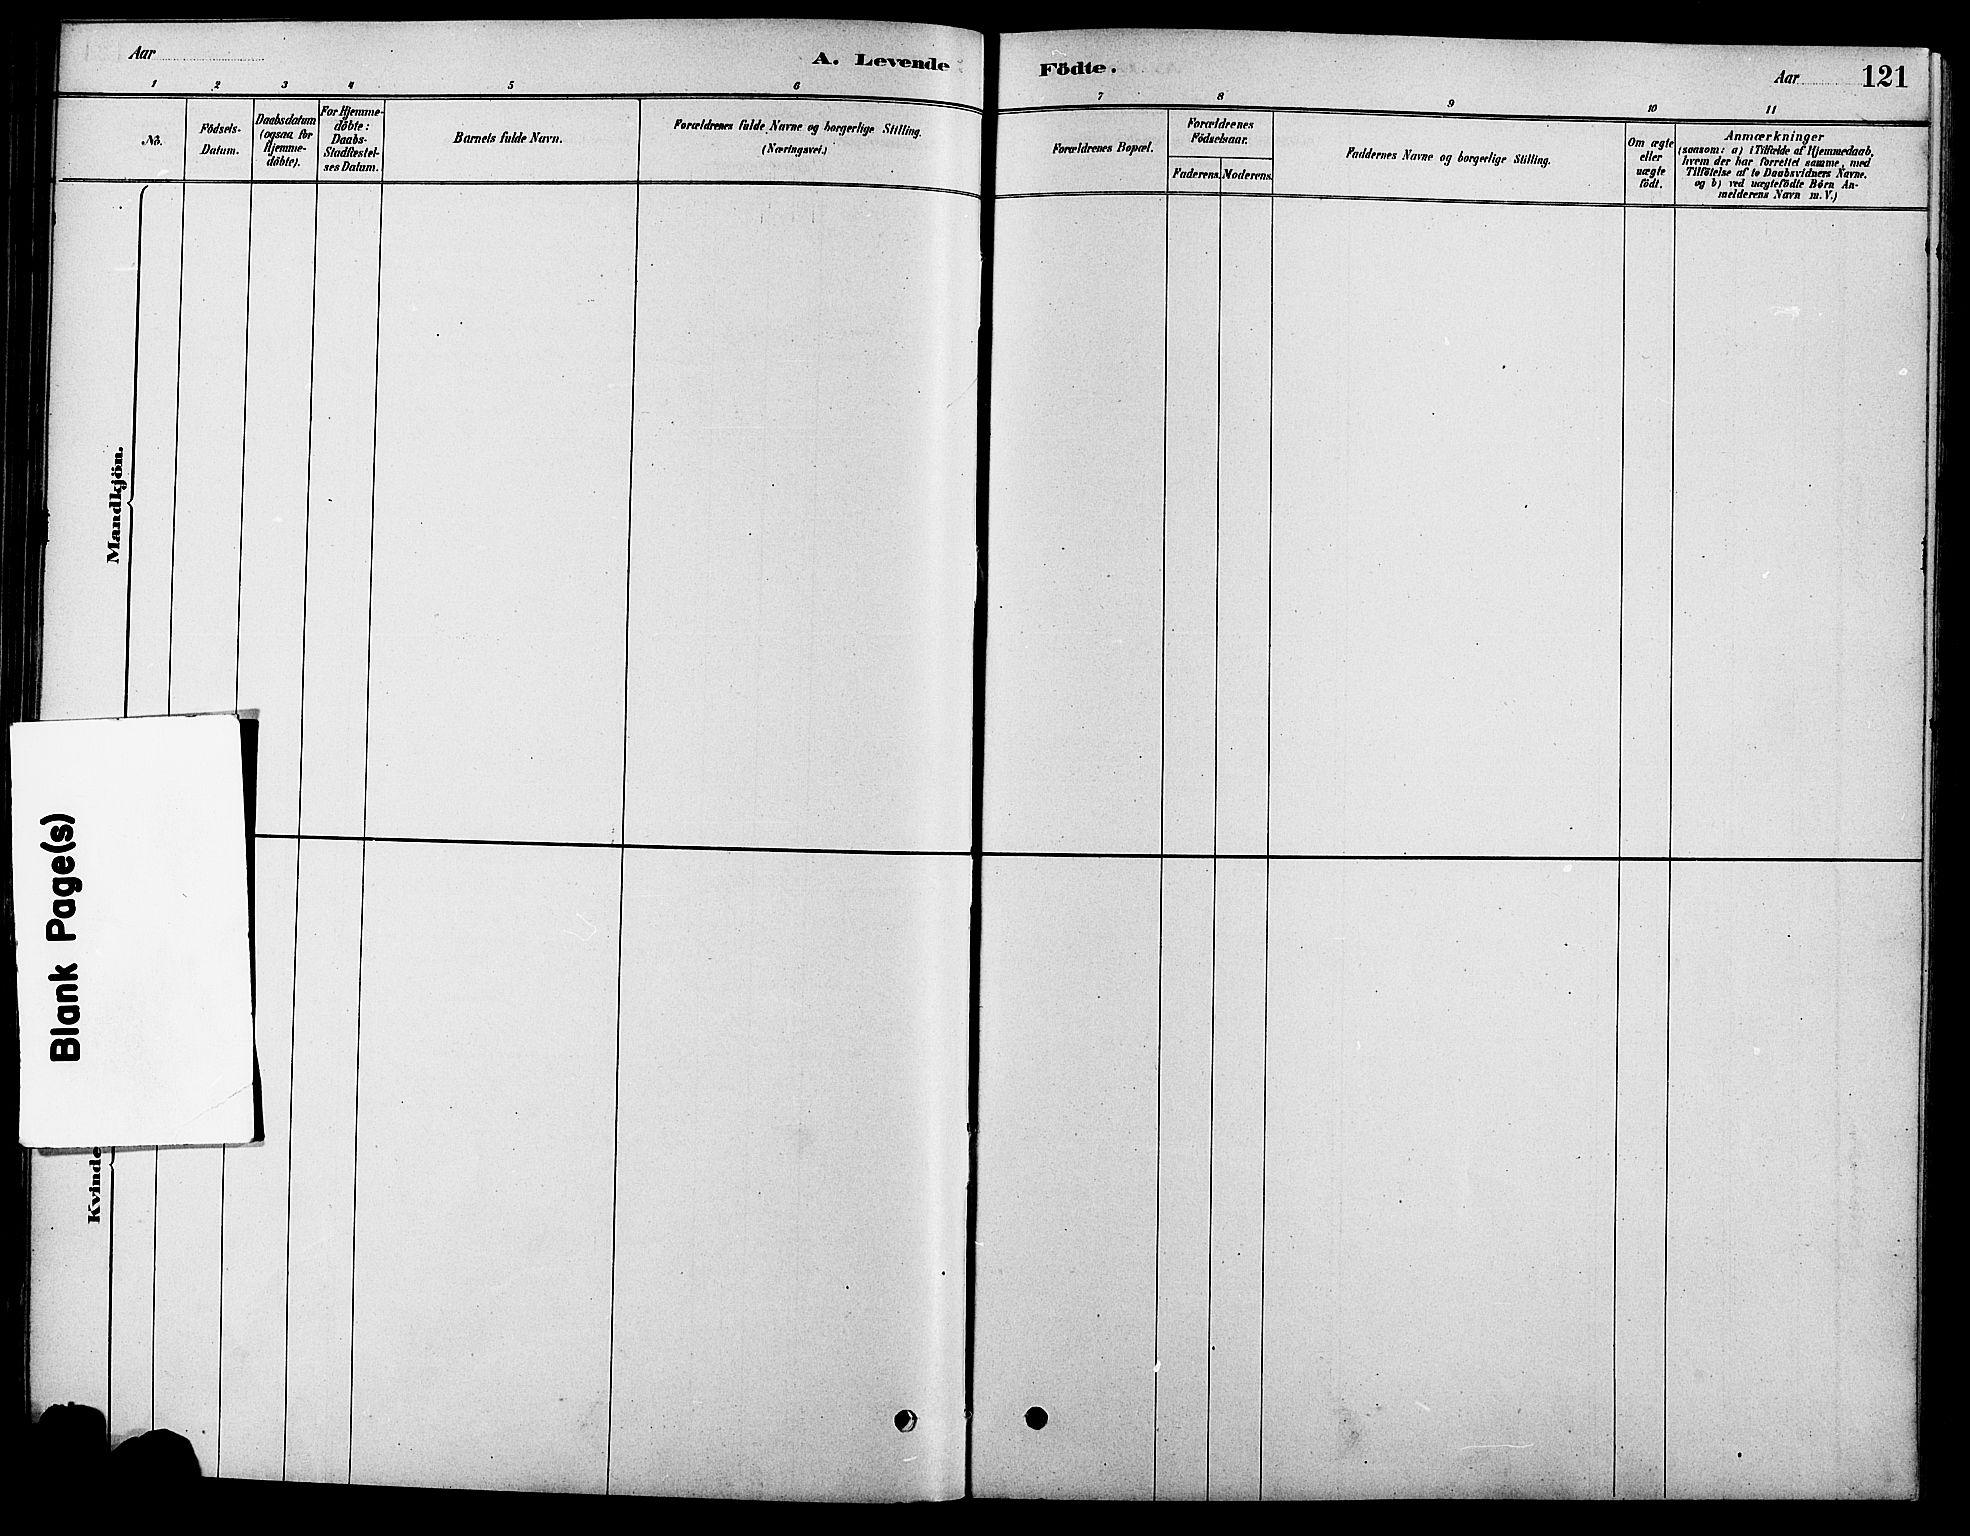 SAH, Fåberg prestekontor, Ministerialbok nr. 8, 1879-1898, s. 121